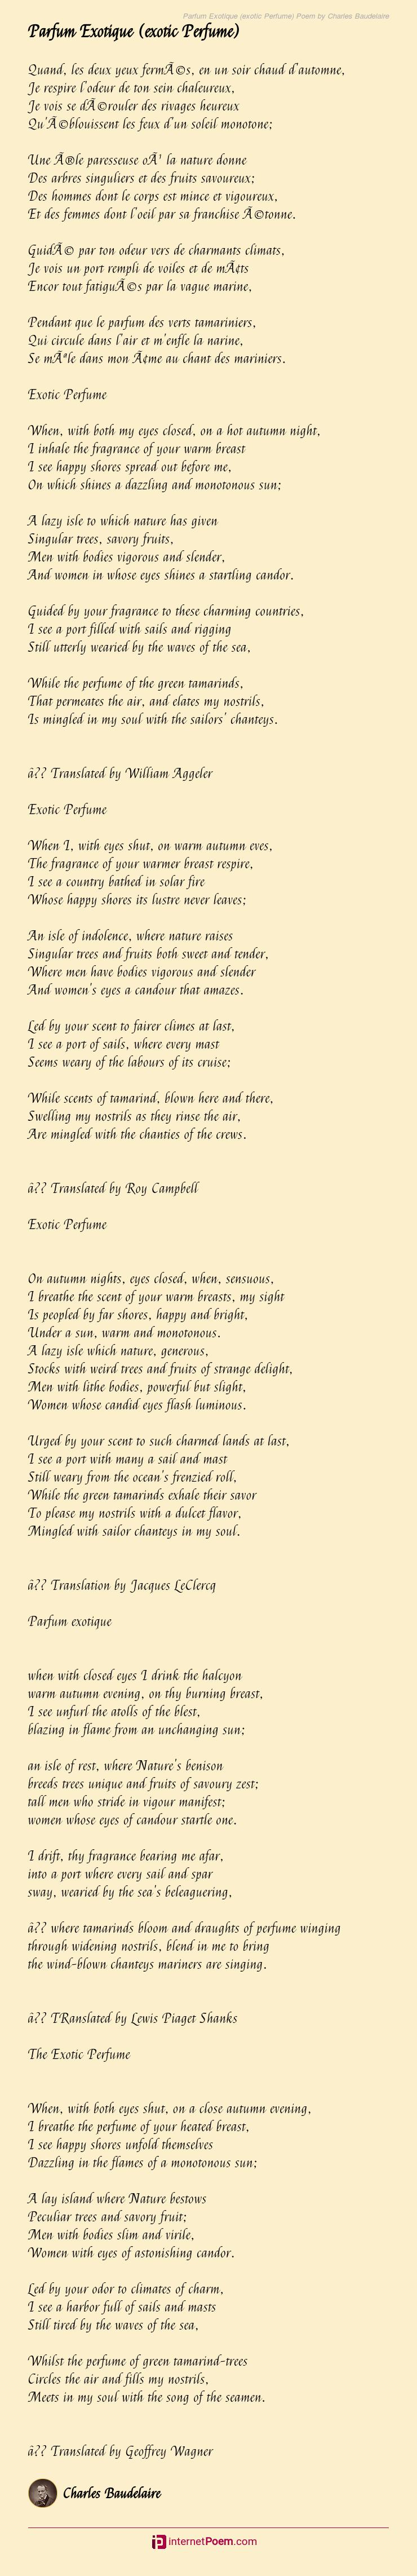 Parfum Exotique Exotic Perfume Poem By Charles Baudelaire